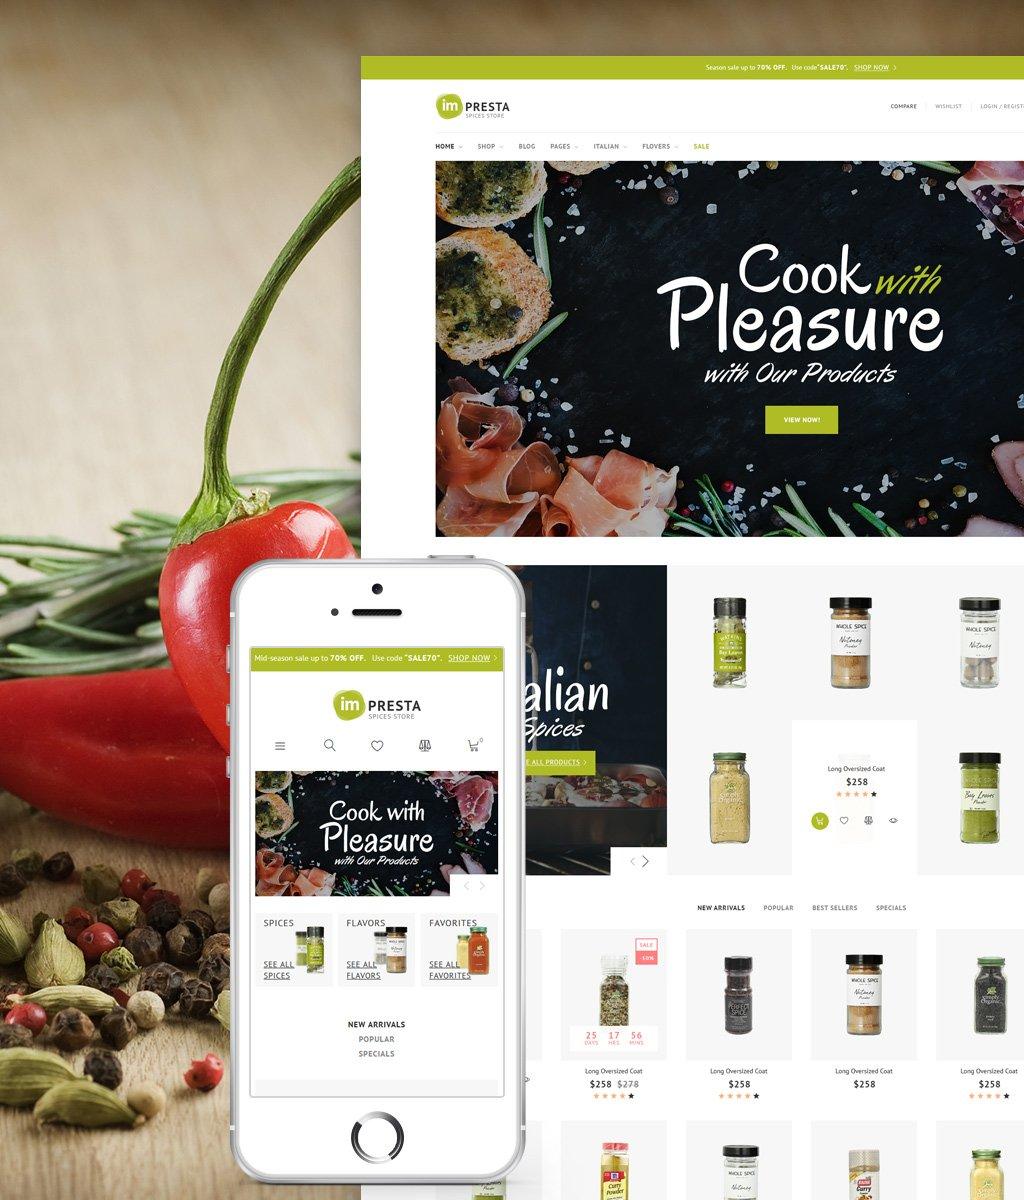 Impresta - Spices Store №64388